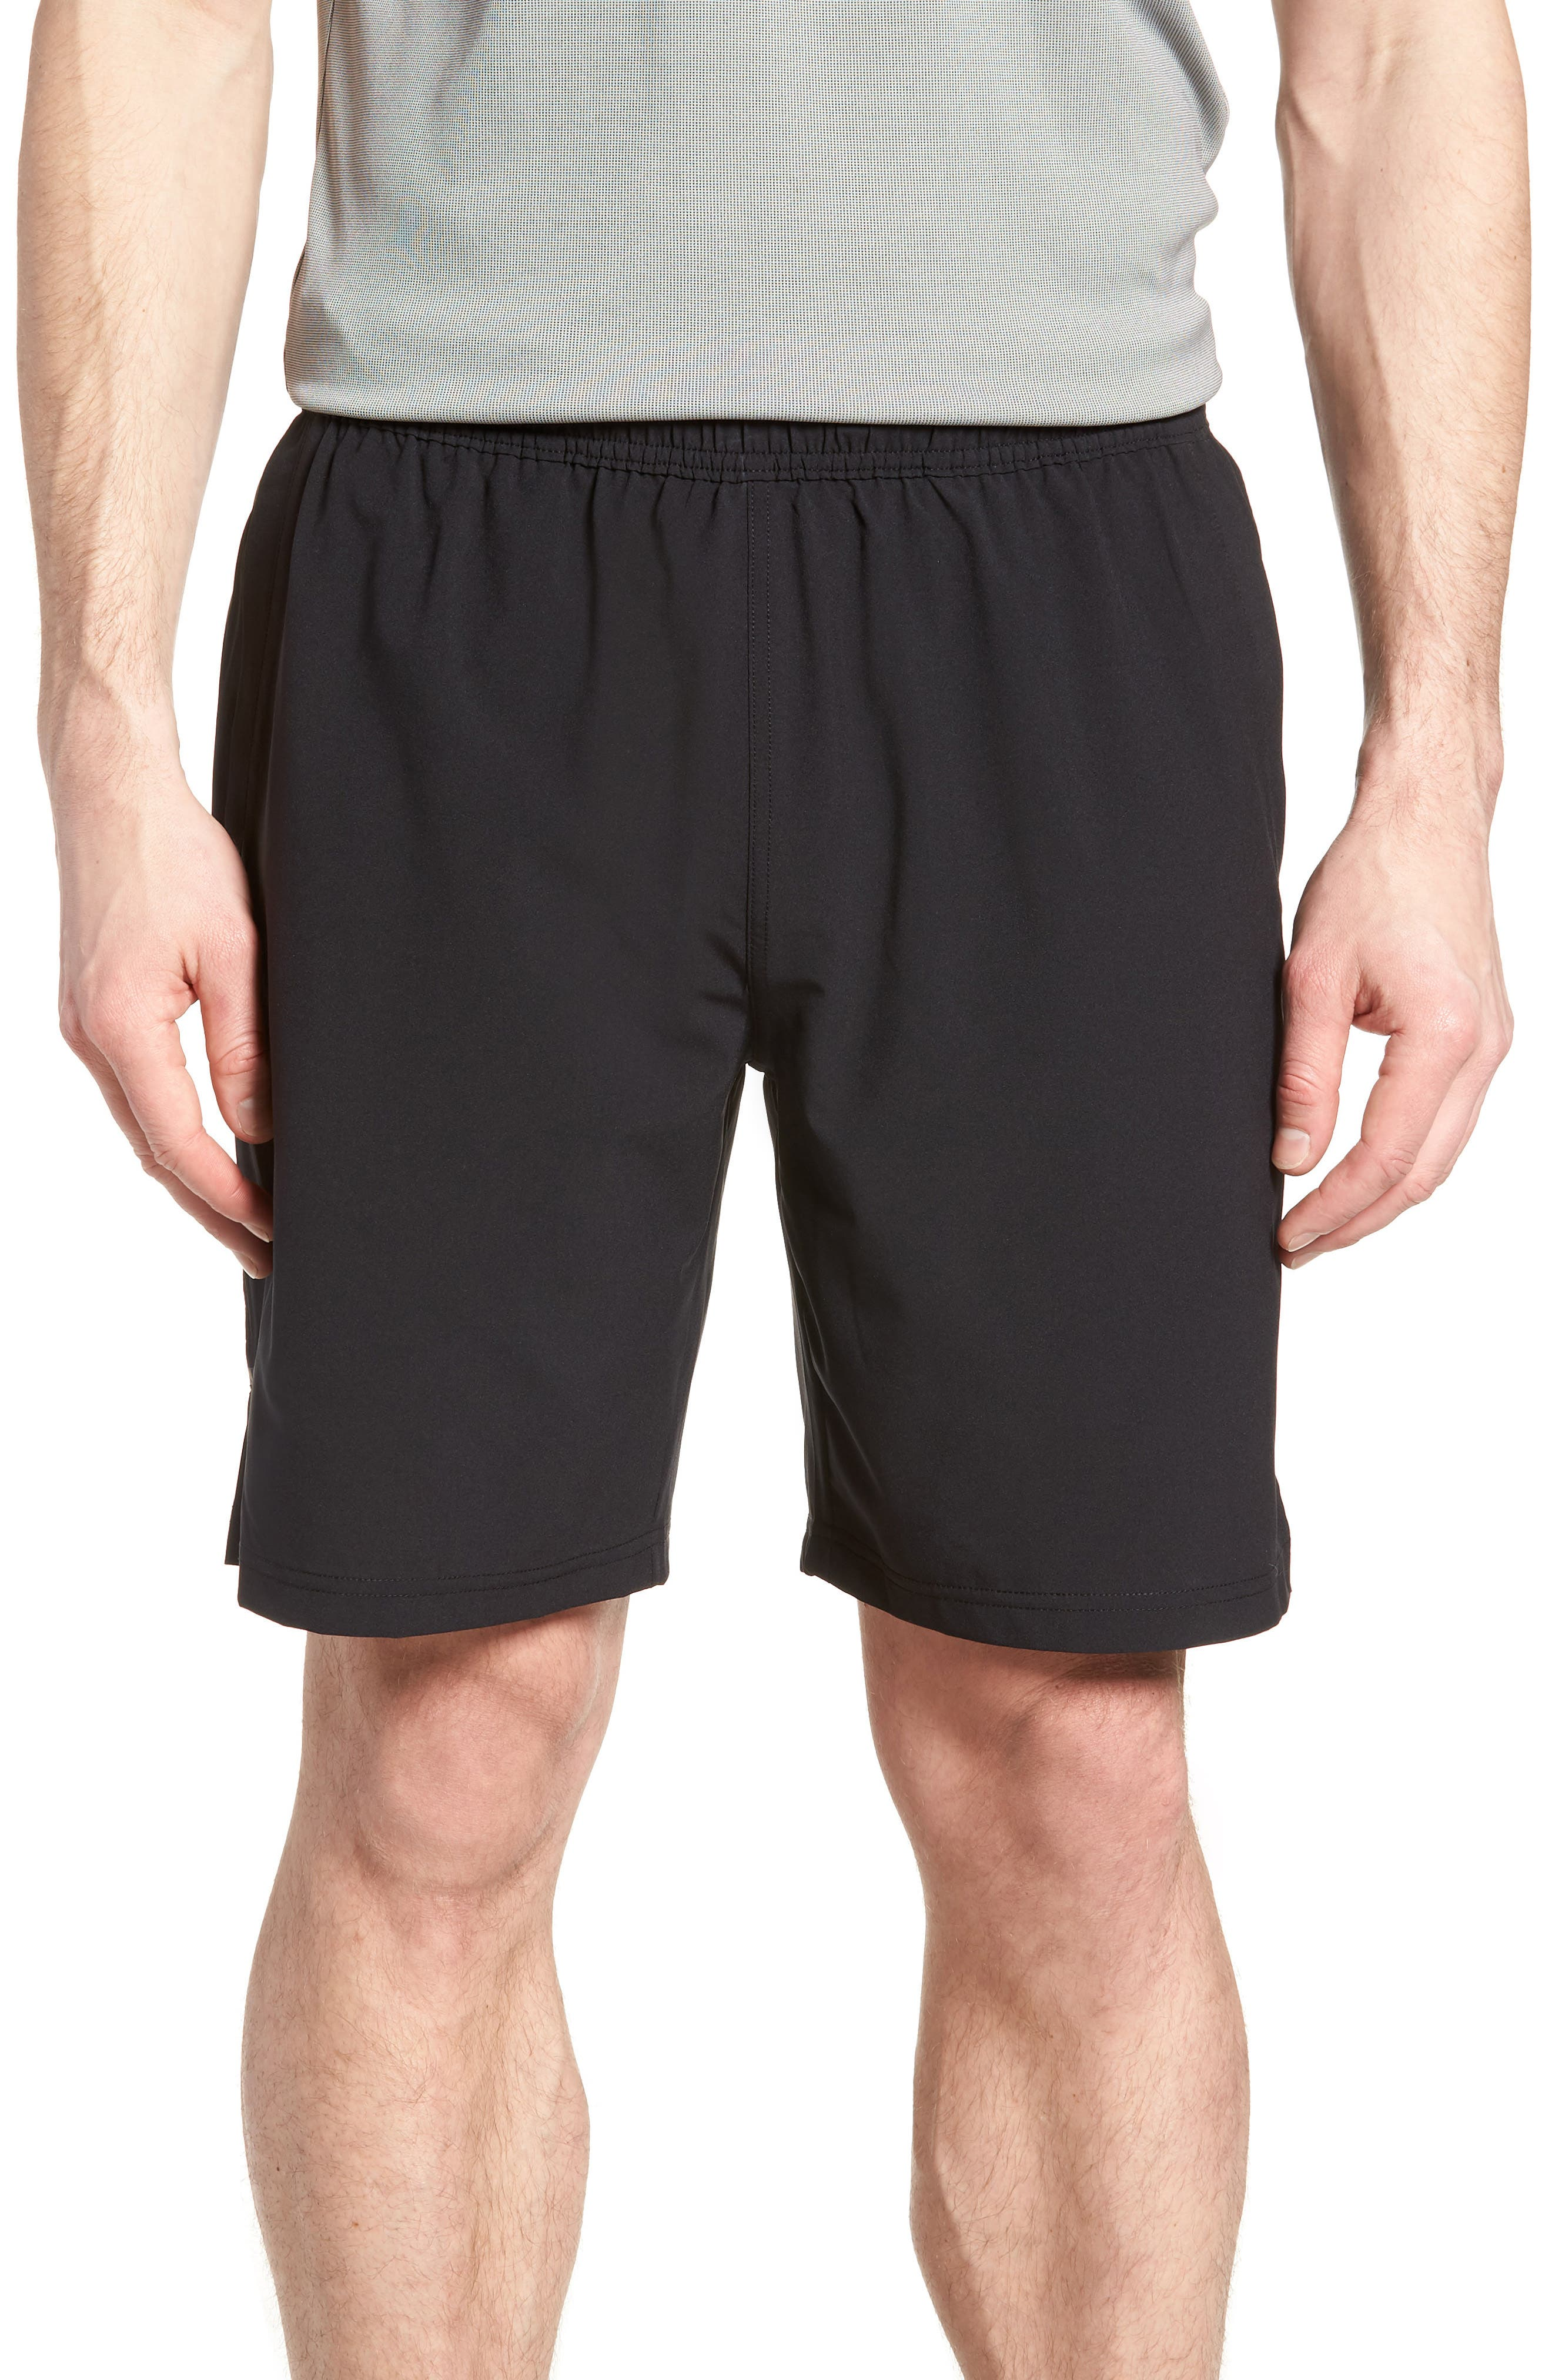 Graphite Perforated Shorts,                             Main thumbnail 1, color,                             BLACK